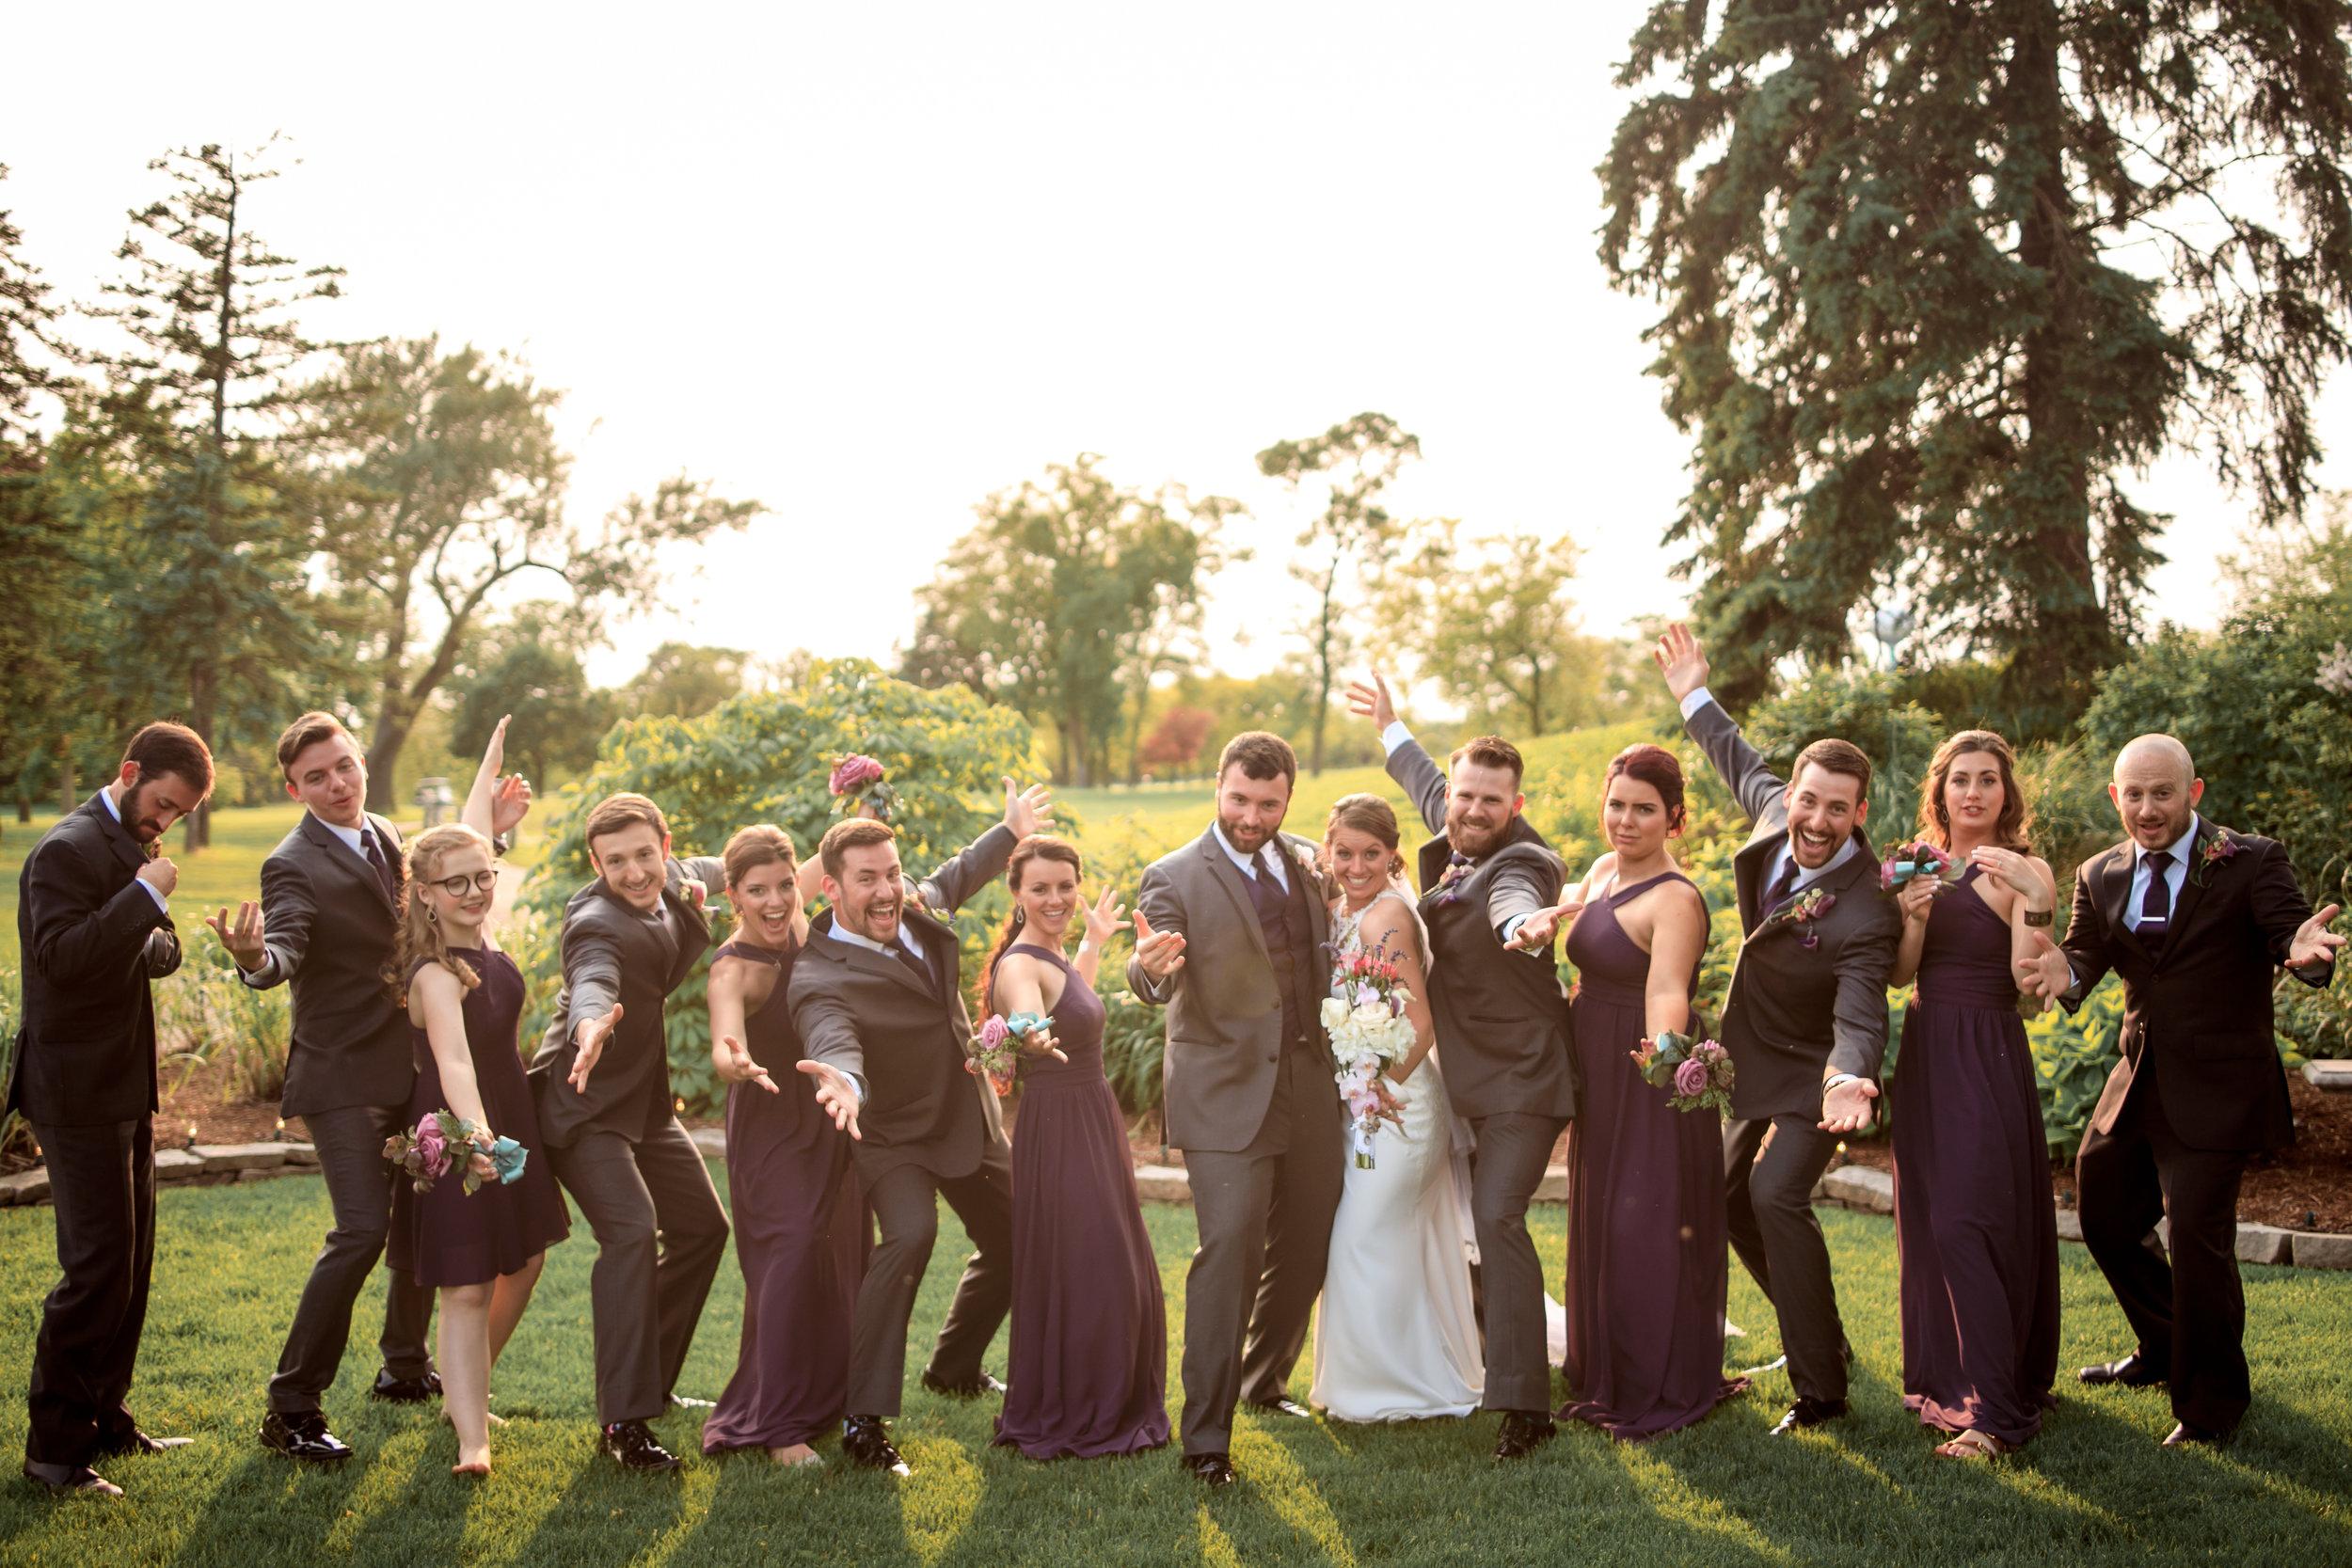 silver-lake-orland-park-wedding60.jpg